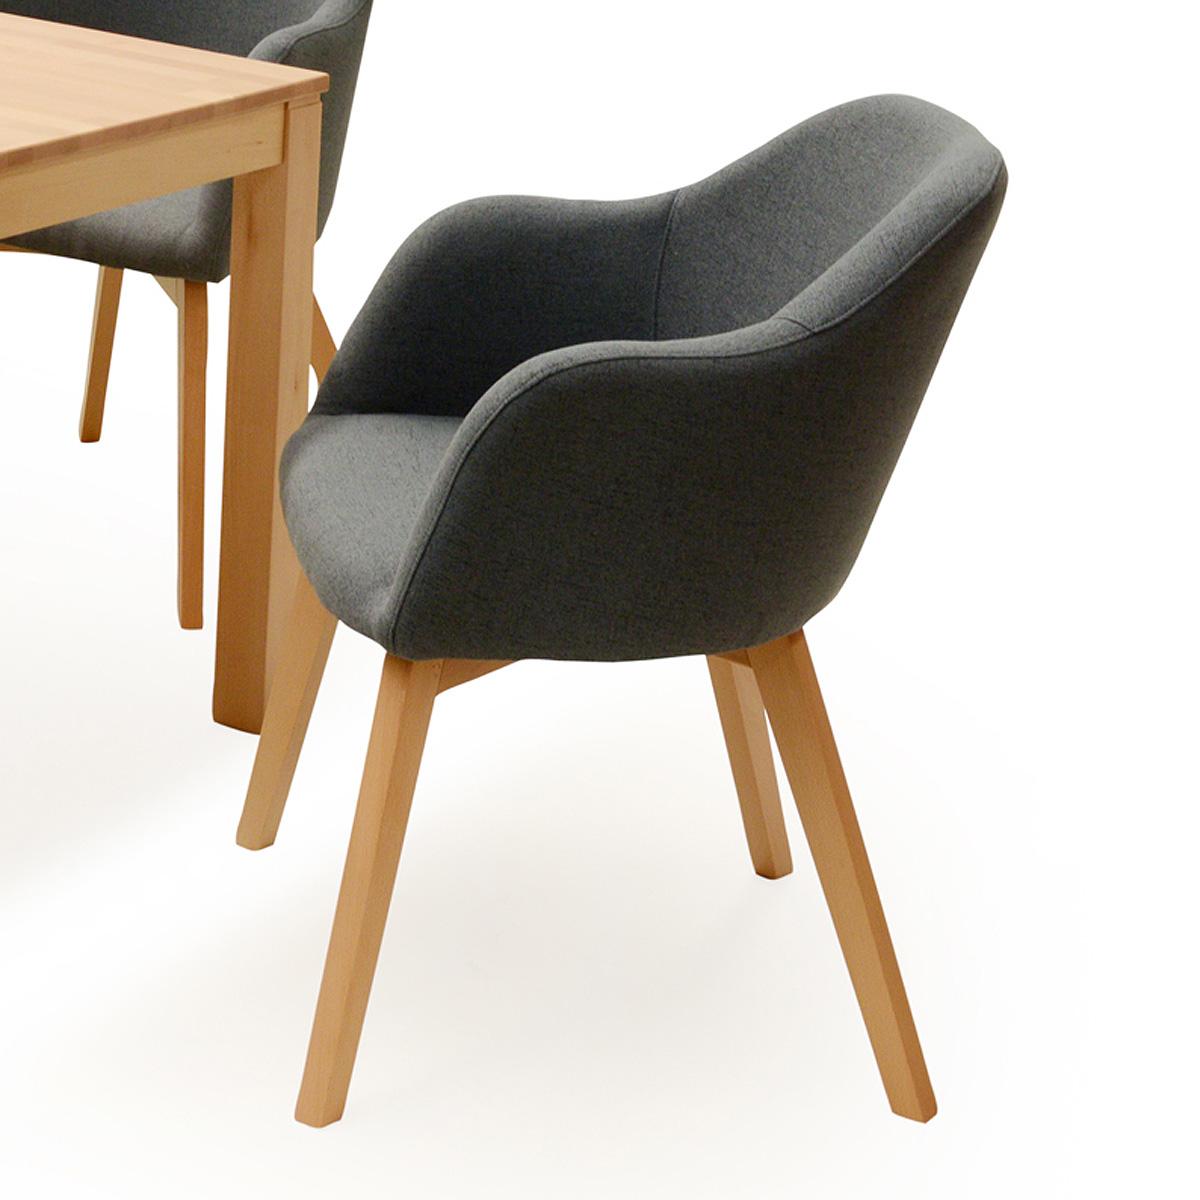 sessel als stuhl williamflooring. Black Bedroom Furniture Sets. Home Design Ideas